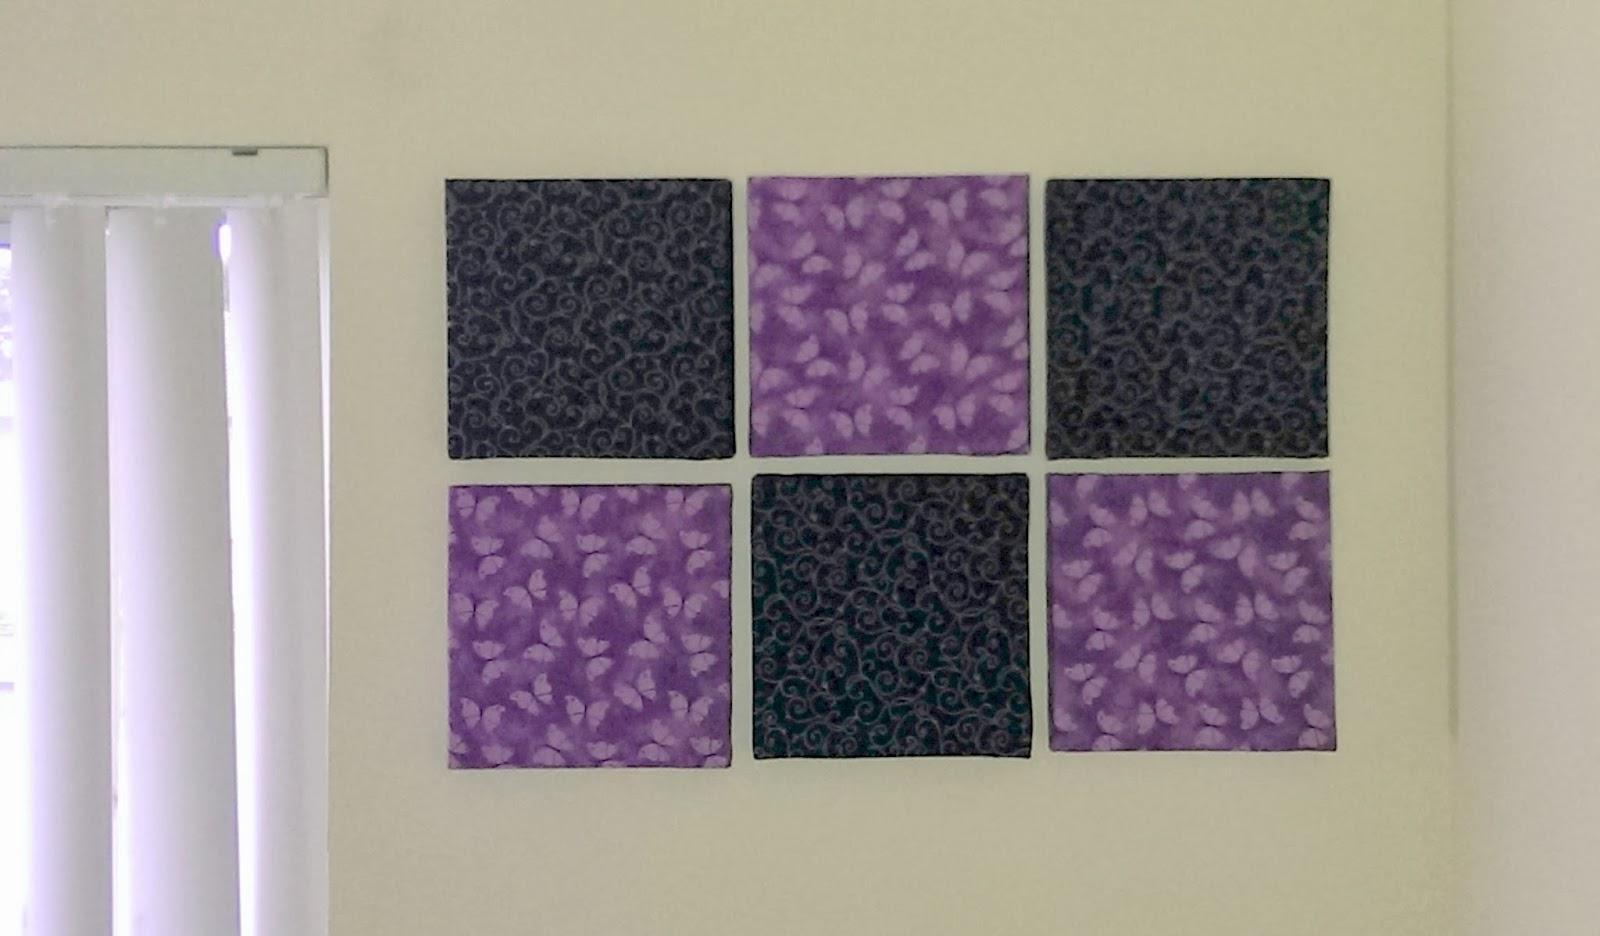 Diy Addiction: Wall Art – Fabric Covered Canvas Within Fabric Canvas Wall Art (Image 6 of 20)